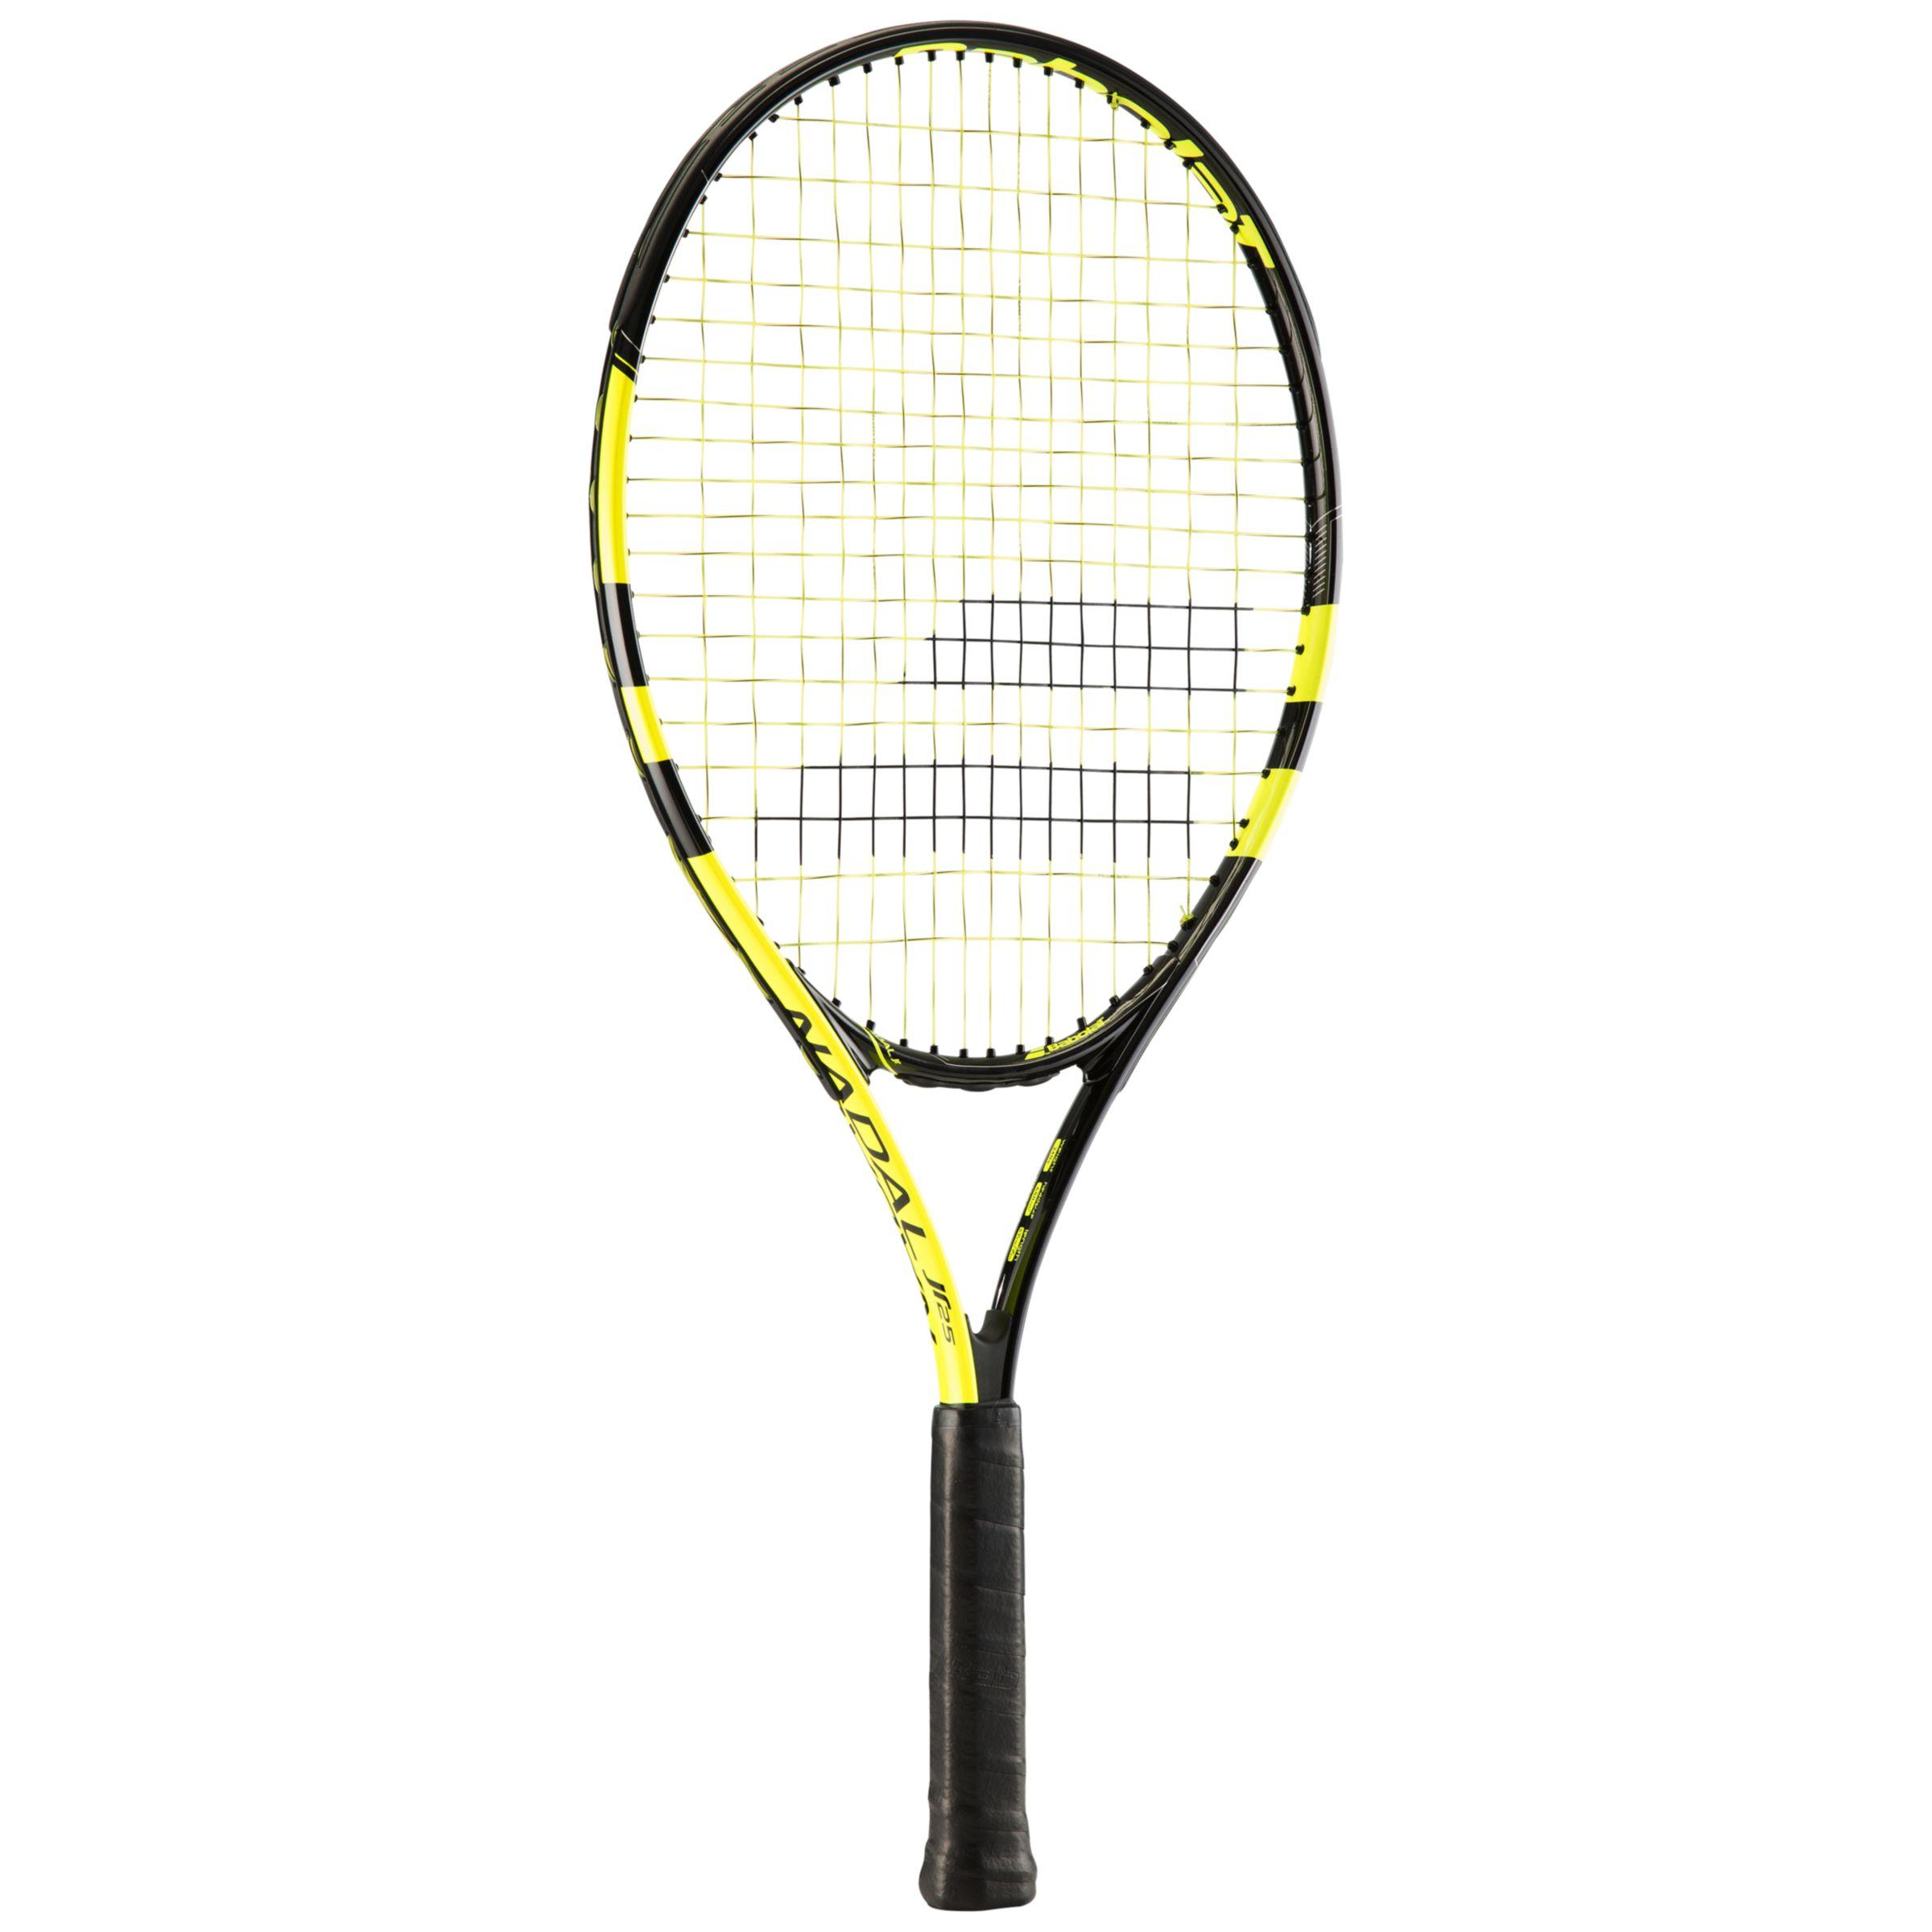 Babolat Babolat Nadal Junior Aluminium Tennis Racket, Yellow/Black